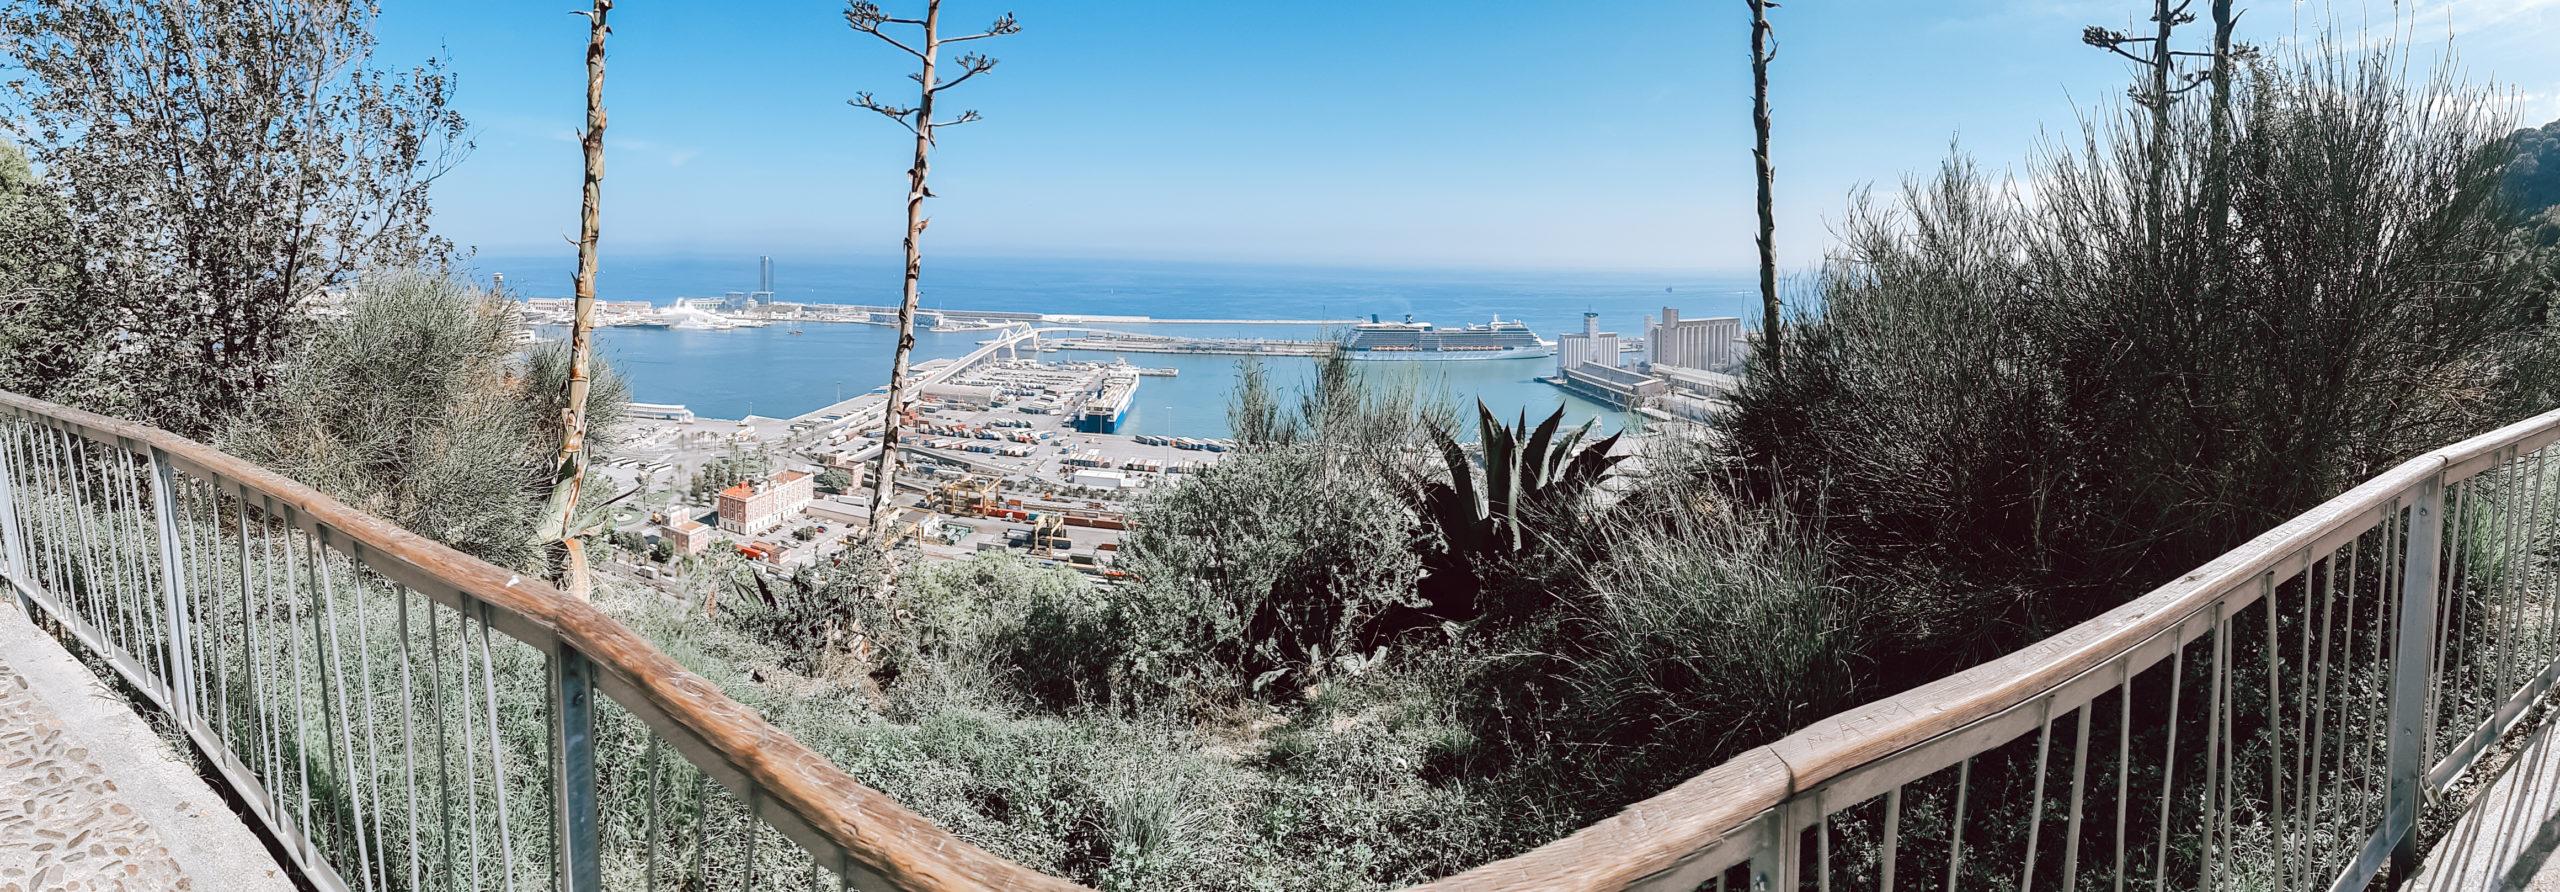 montjuic hill barcelona barcelona harbour view livinglikev fashion blogger living like v